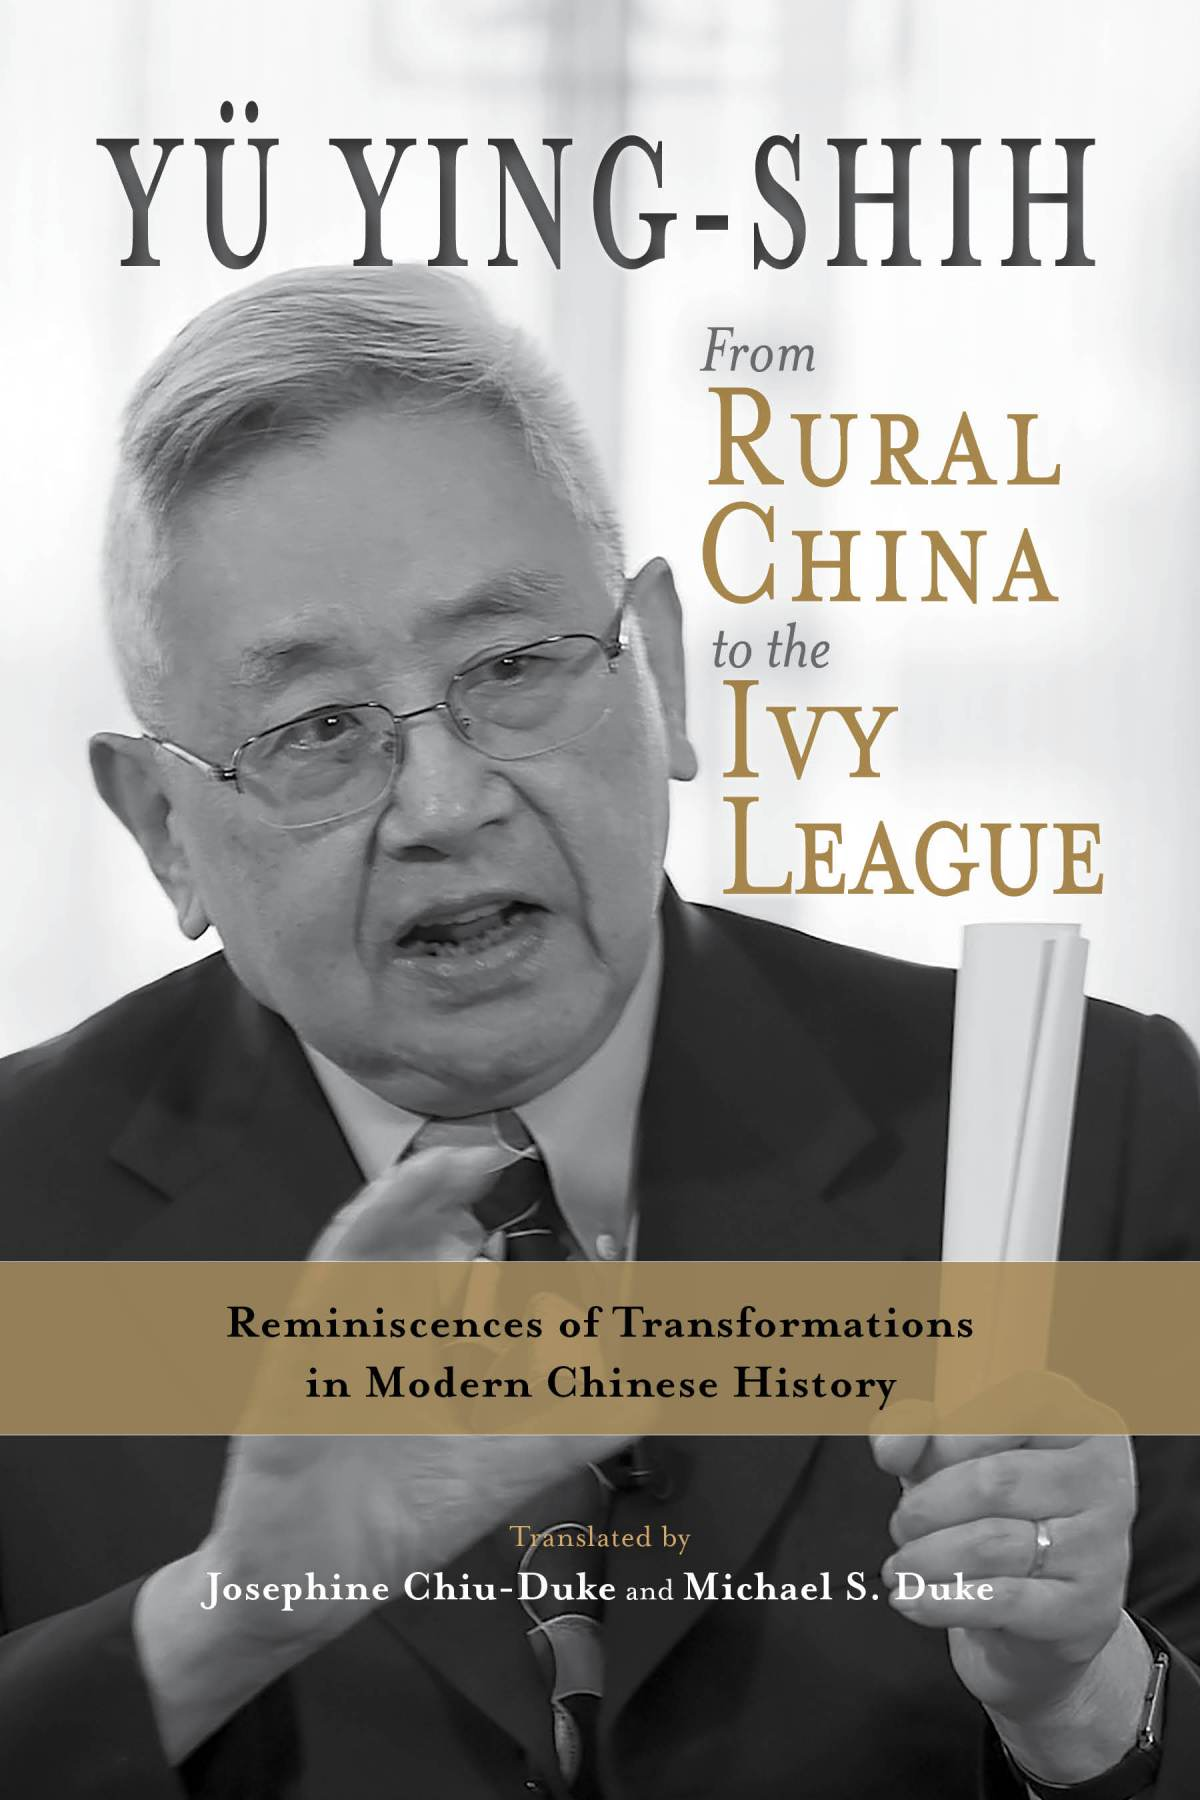 Professor Yü Ying-shih